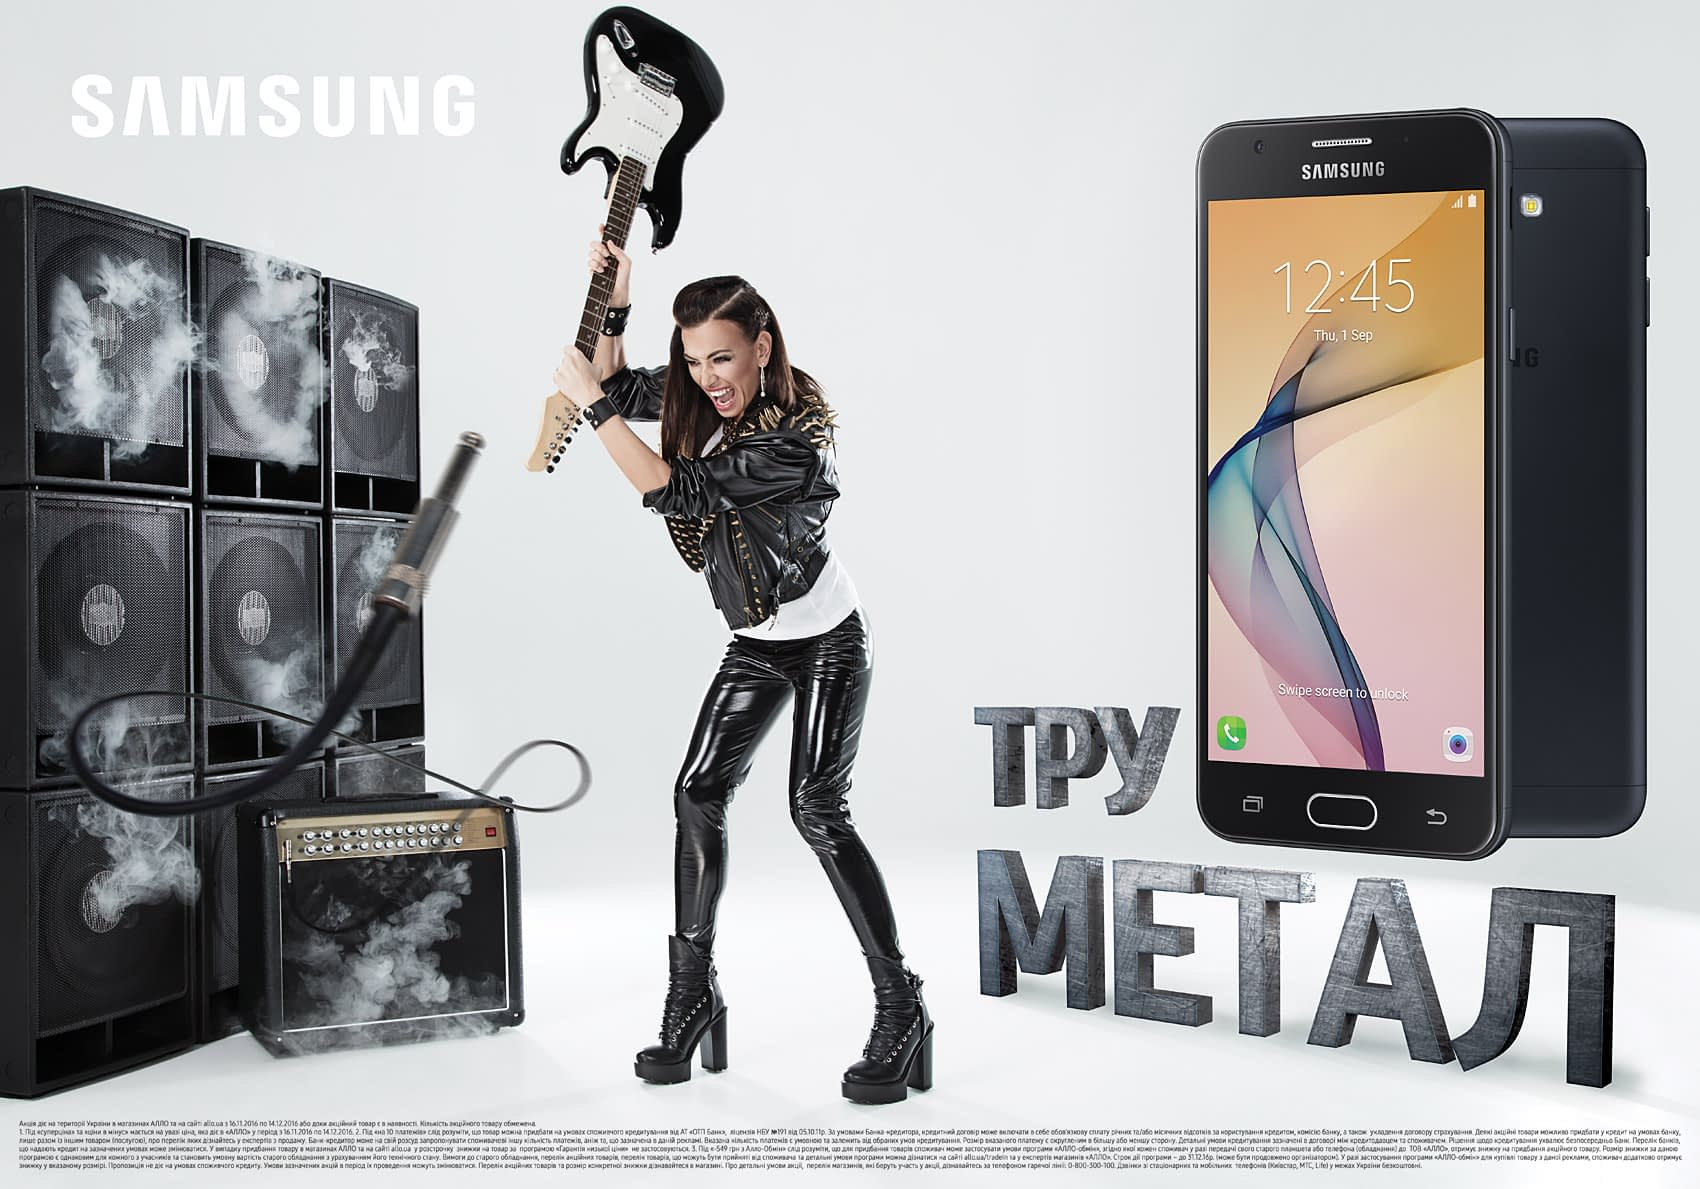 Advertising Samsung